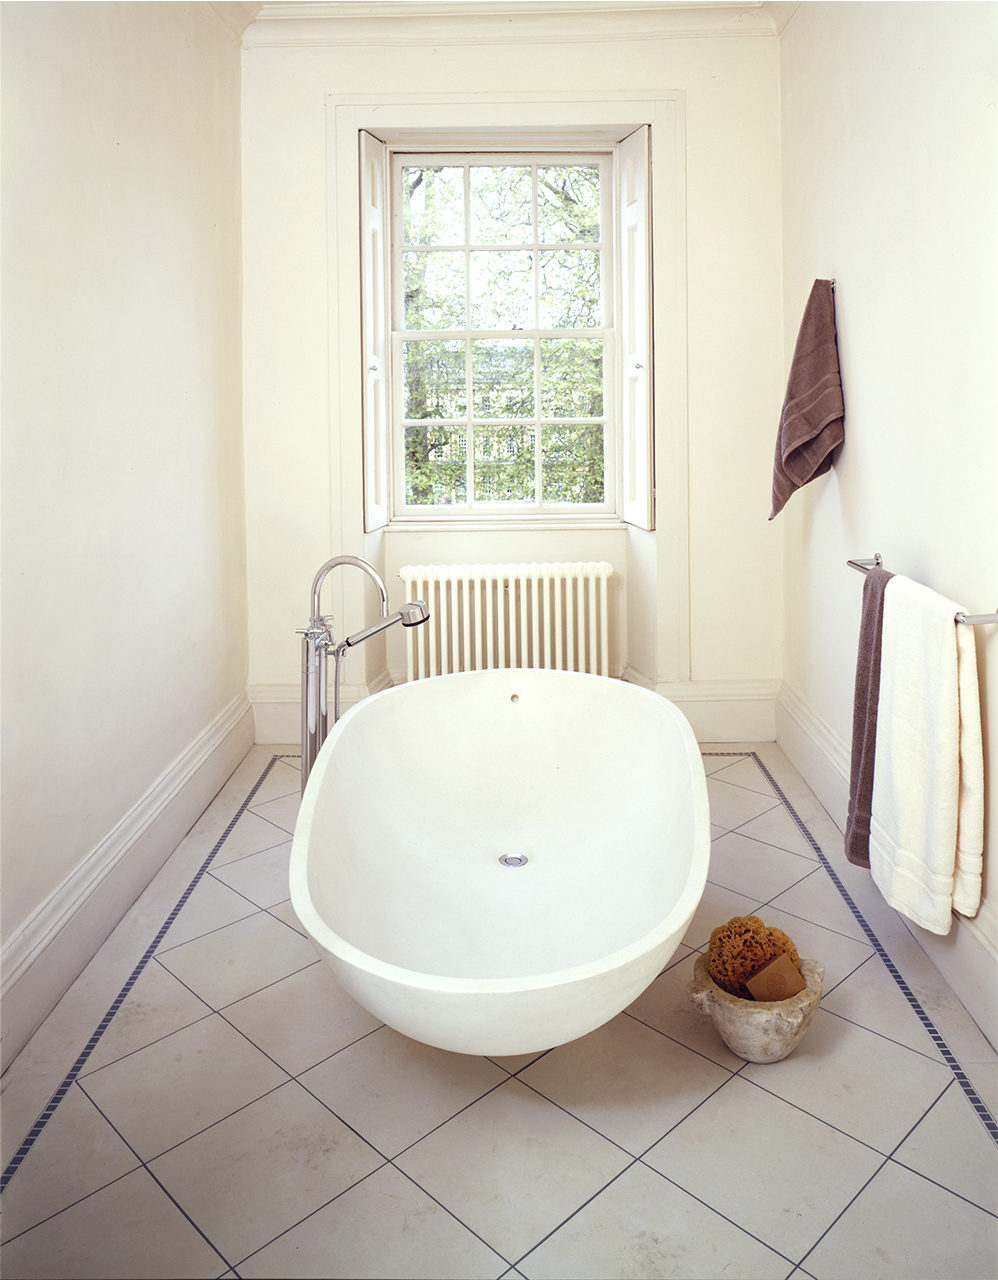 amitco bathroom